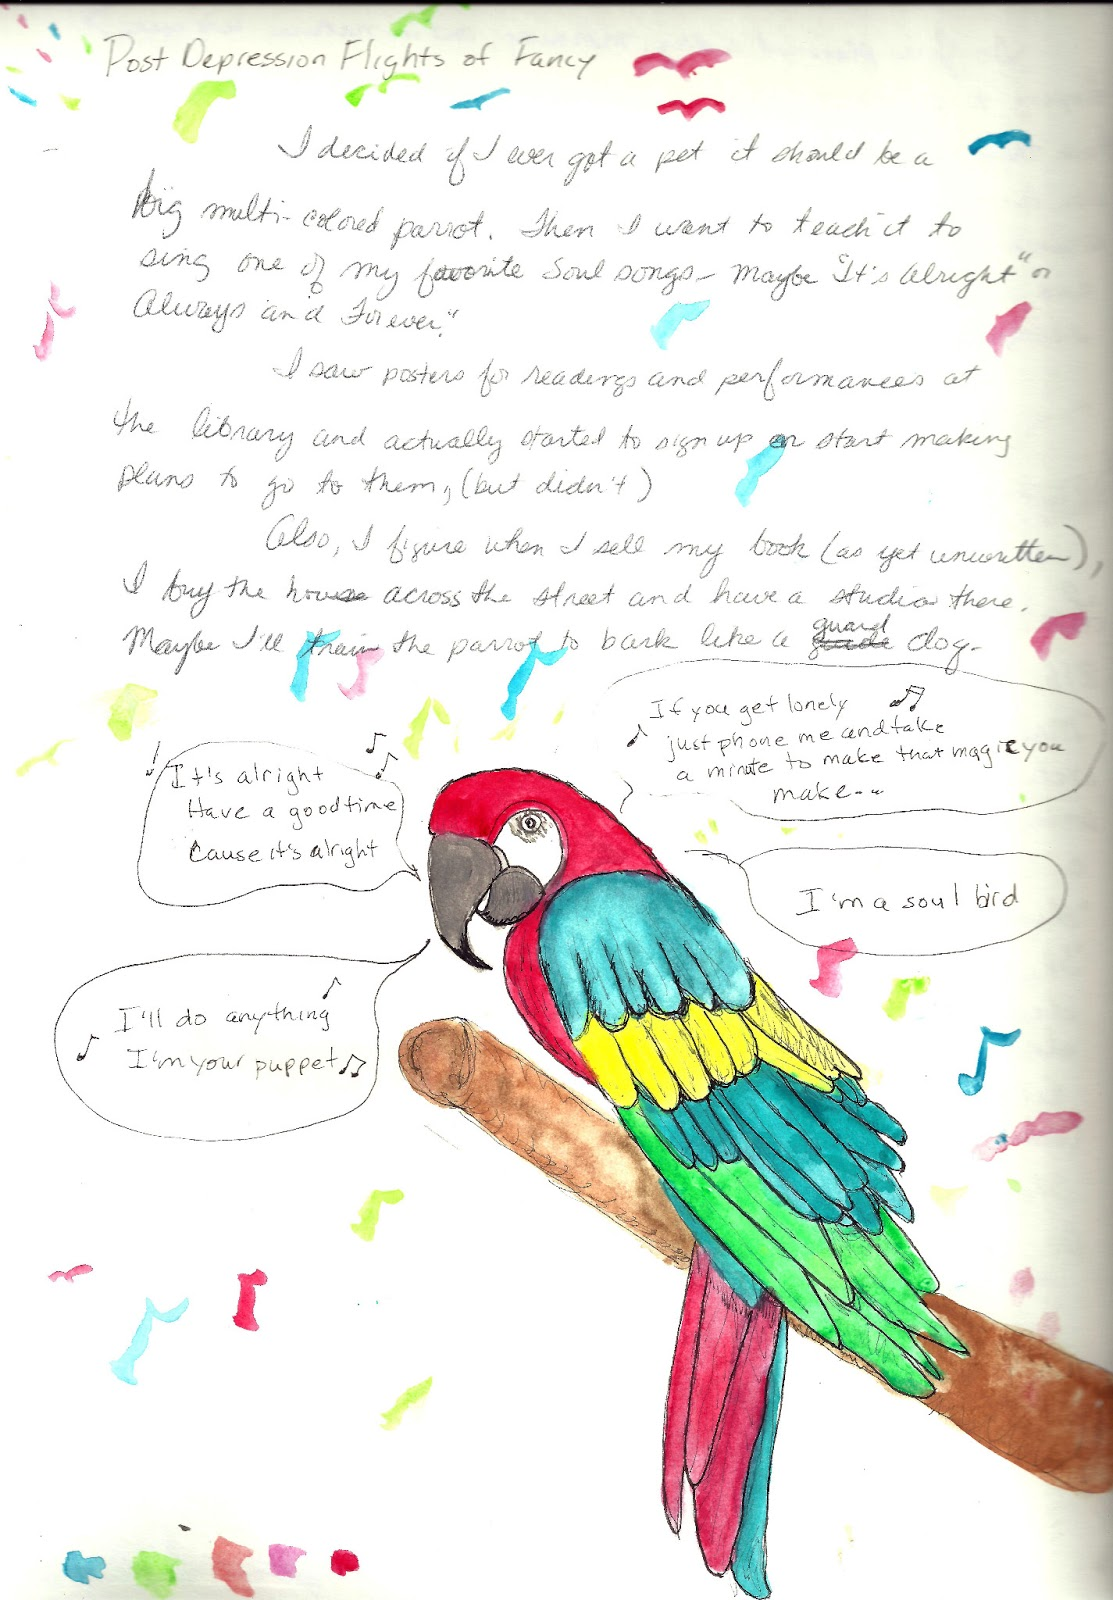 Essay On Parrot In Marathi